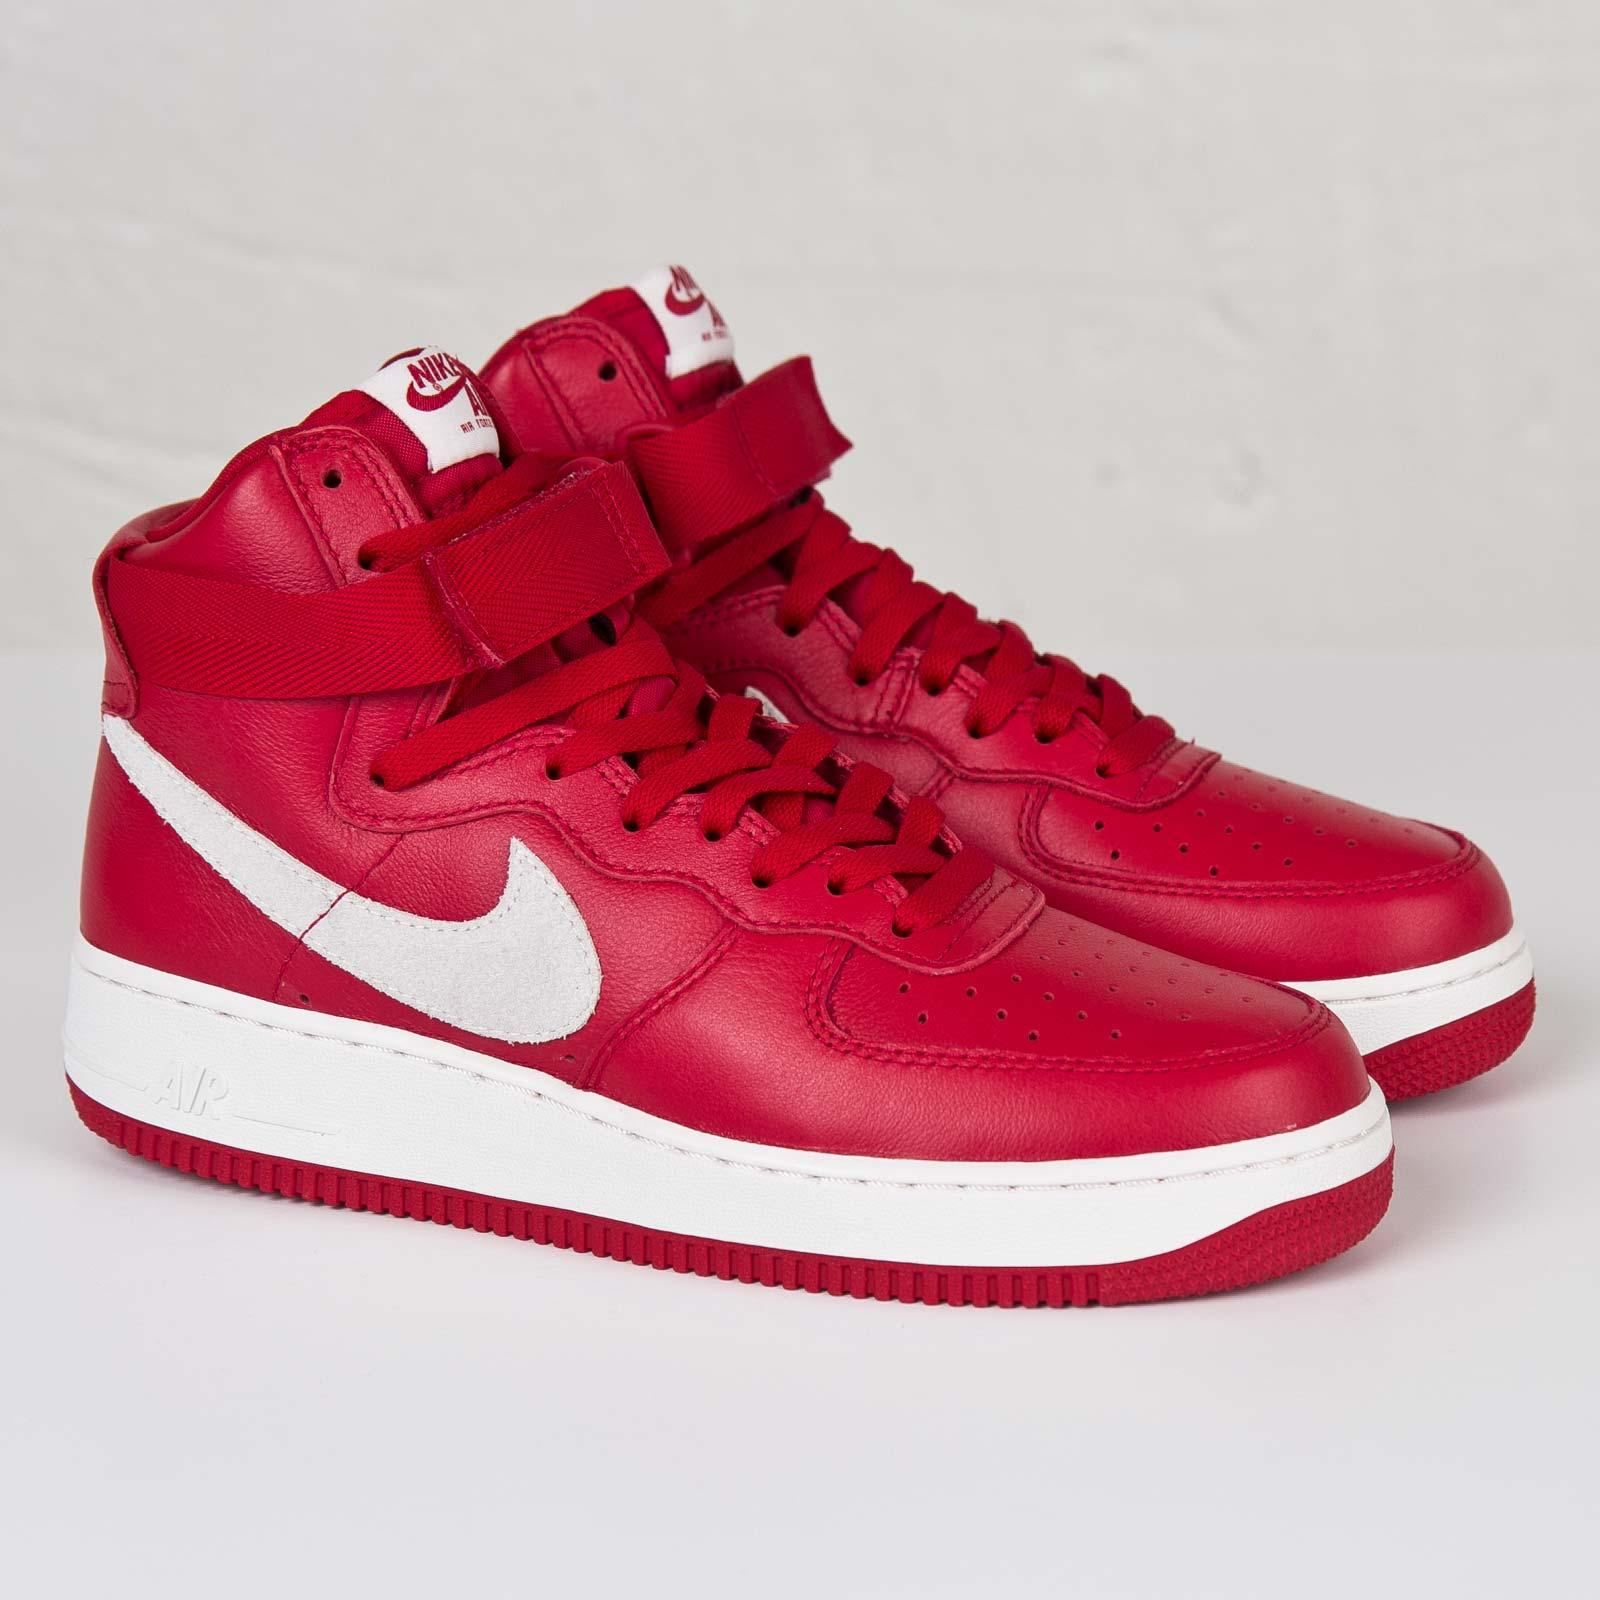 buy popular 53035 6722e Nike Air Force 1 Hi Retro QS